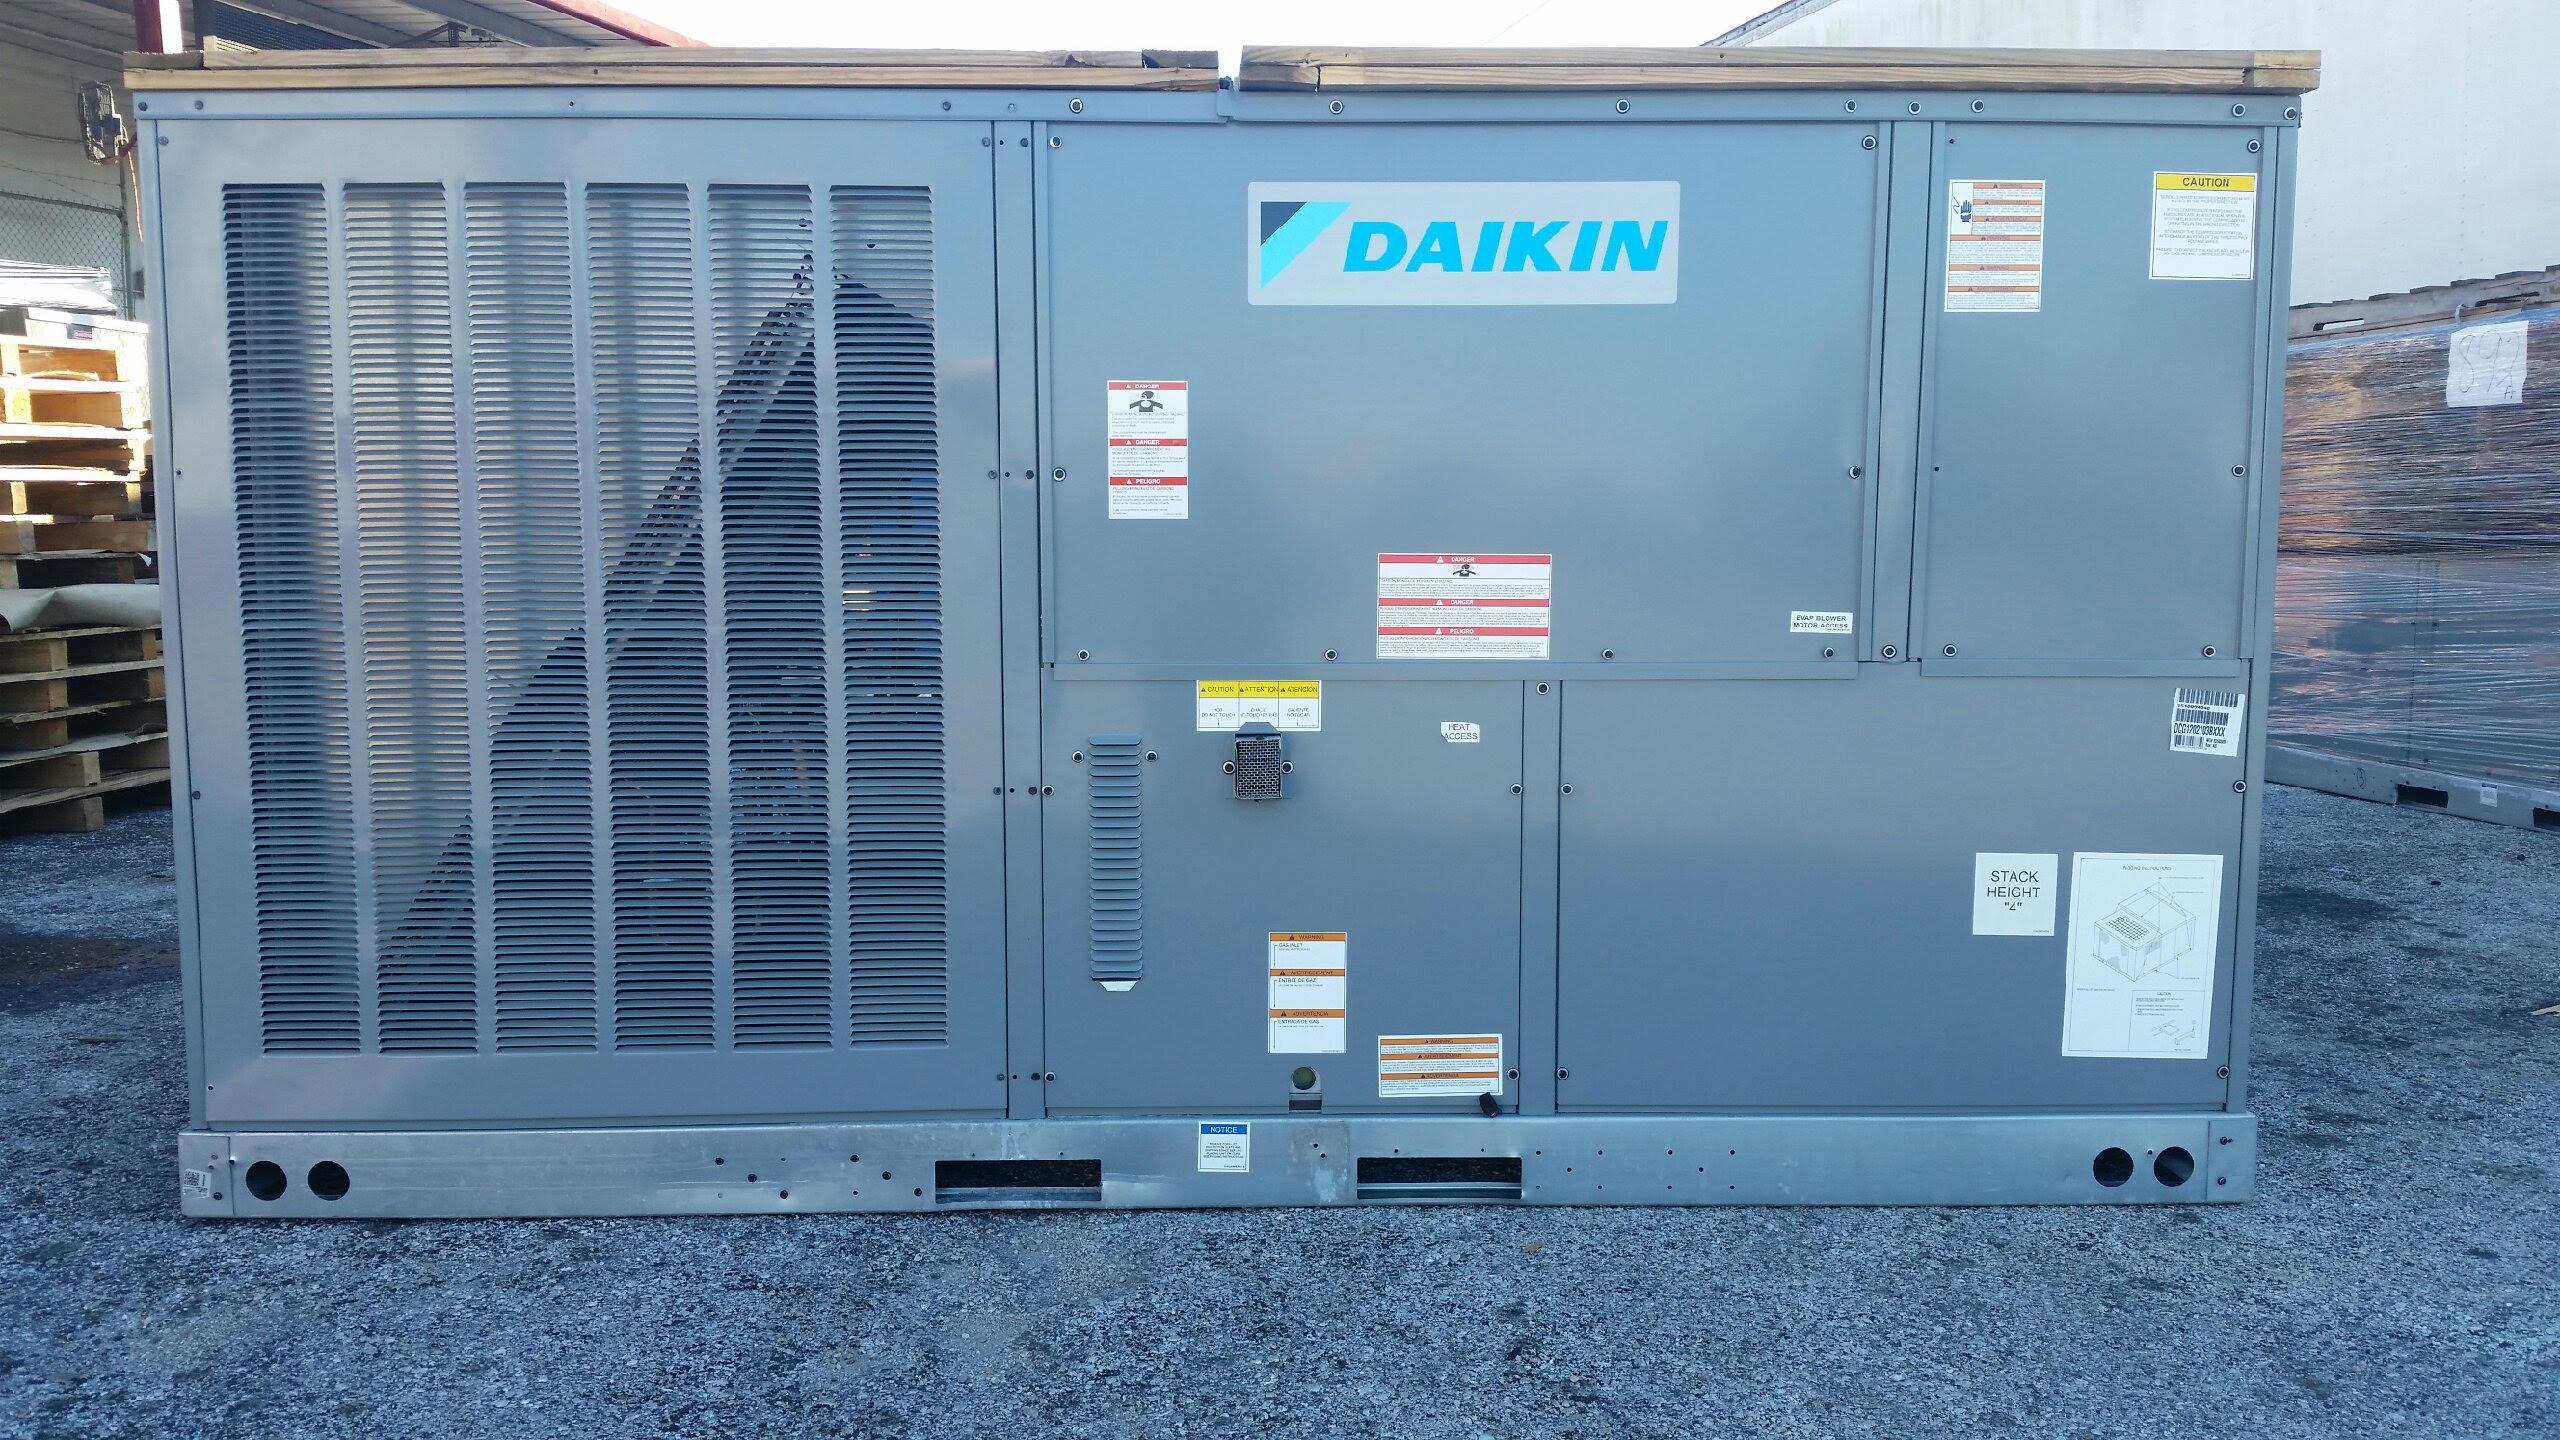 daikin split ac 1 5 ton wiring diagram what is a workflow 10 gas package unit 210k btu 208 230v or 460v 3